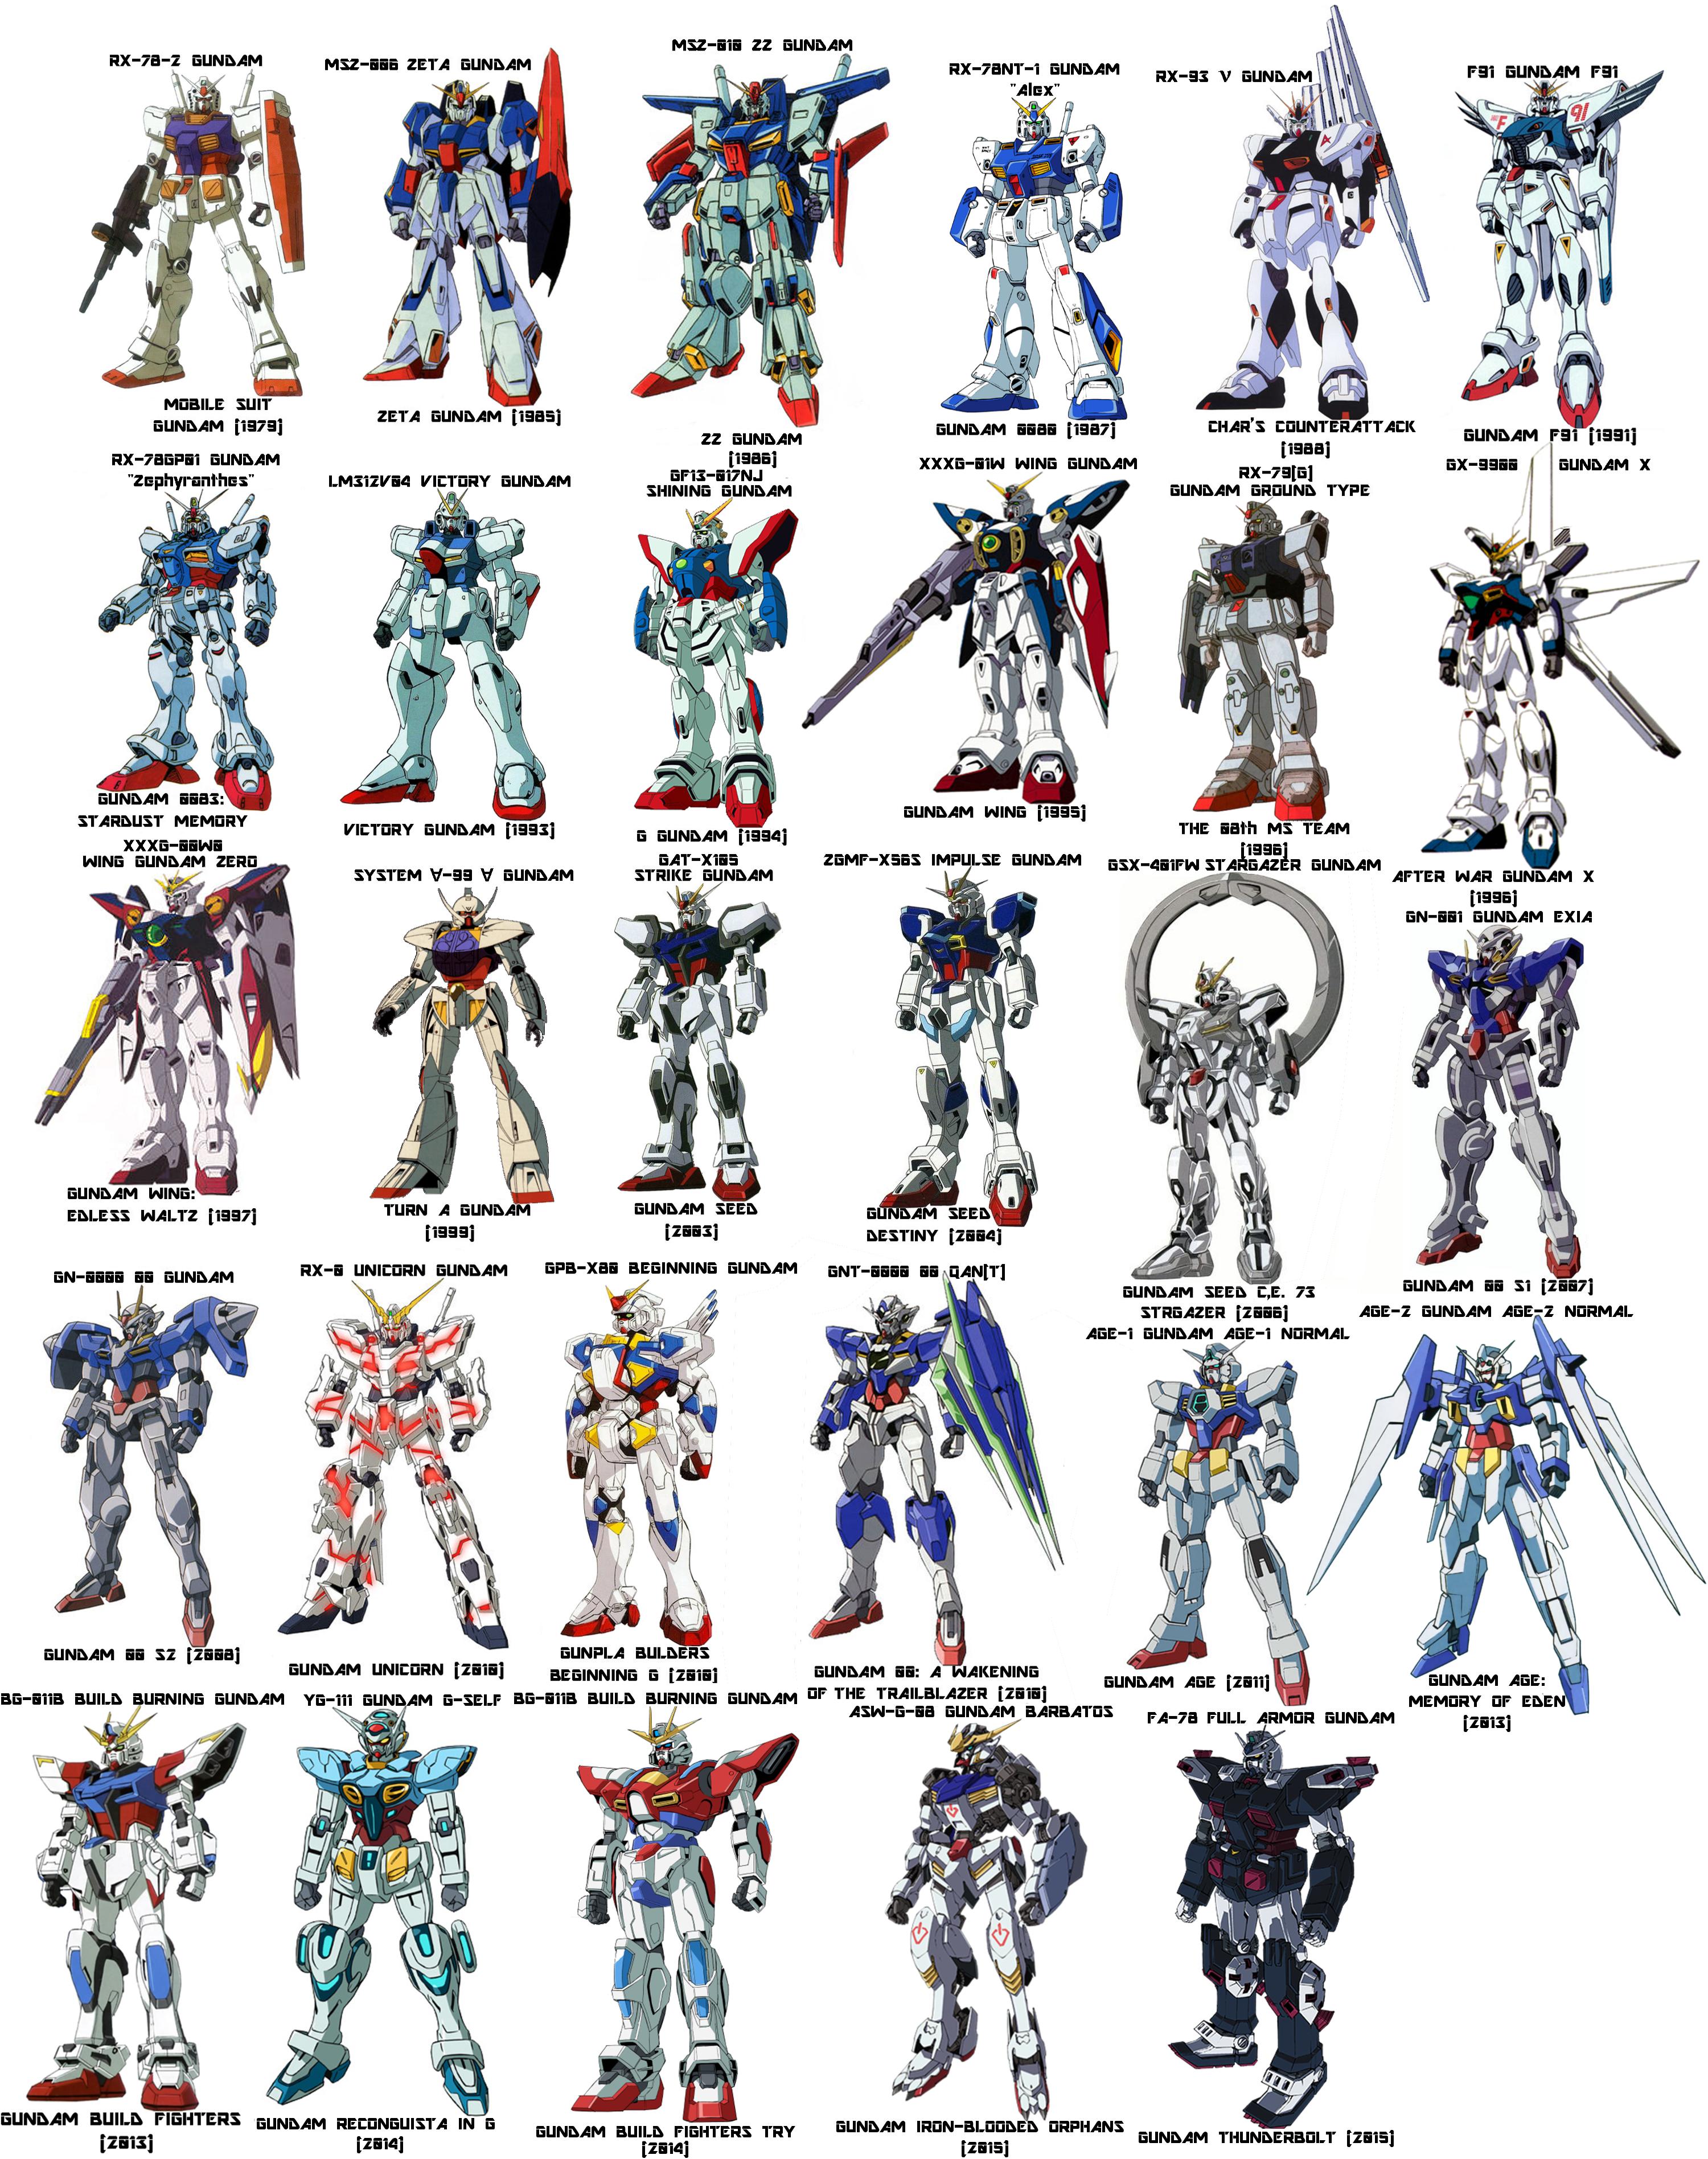 Pin by Derek Aldana on Characterz Gundam art, Gundam